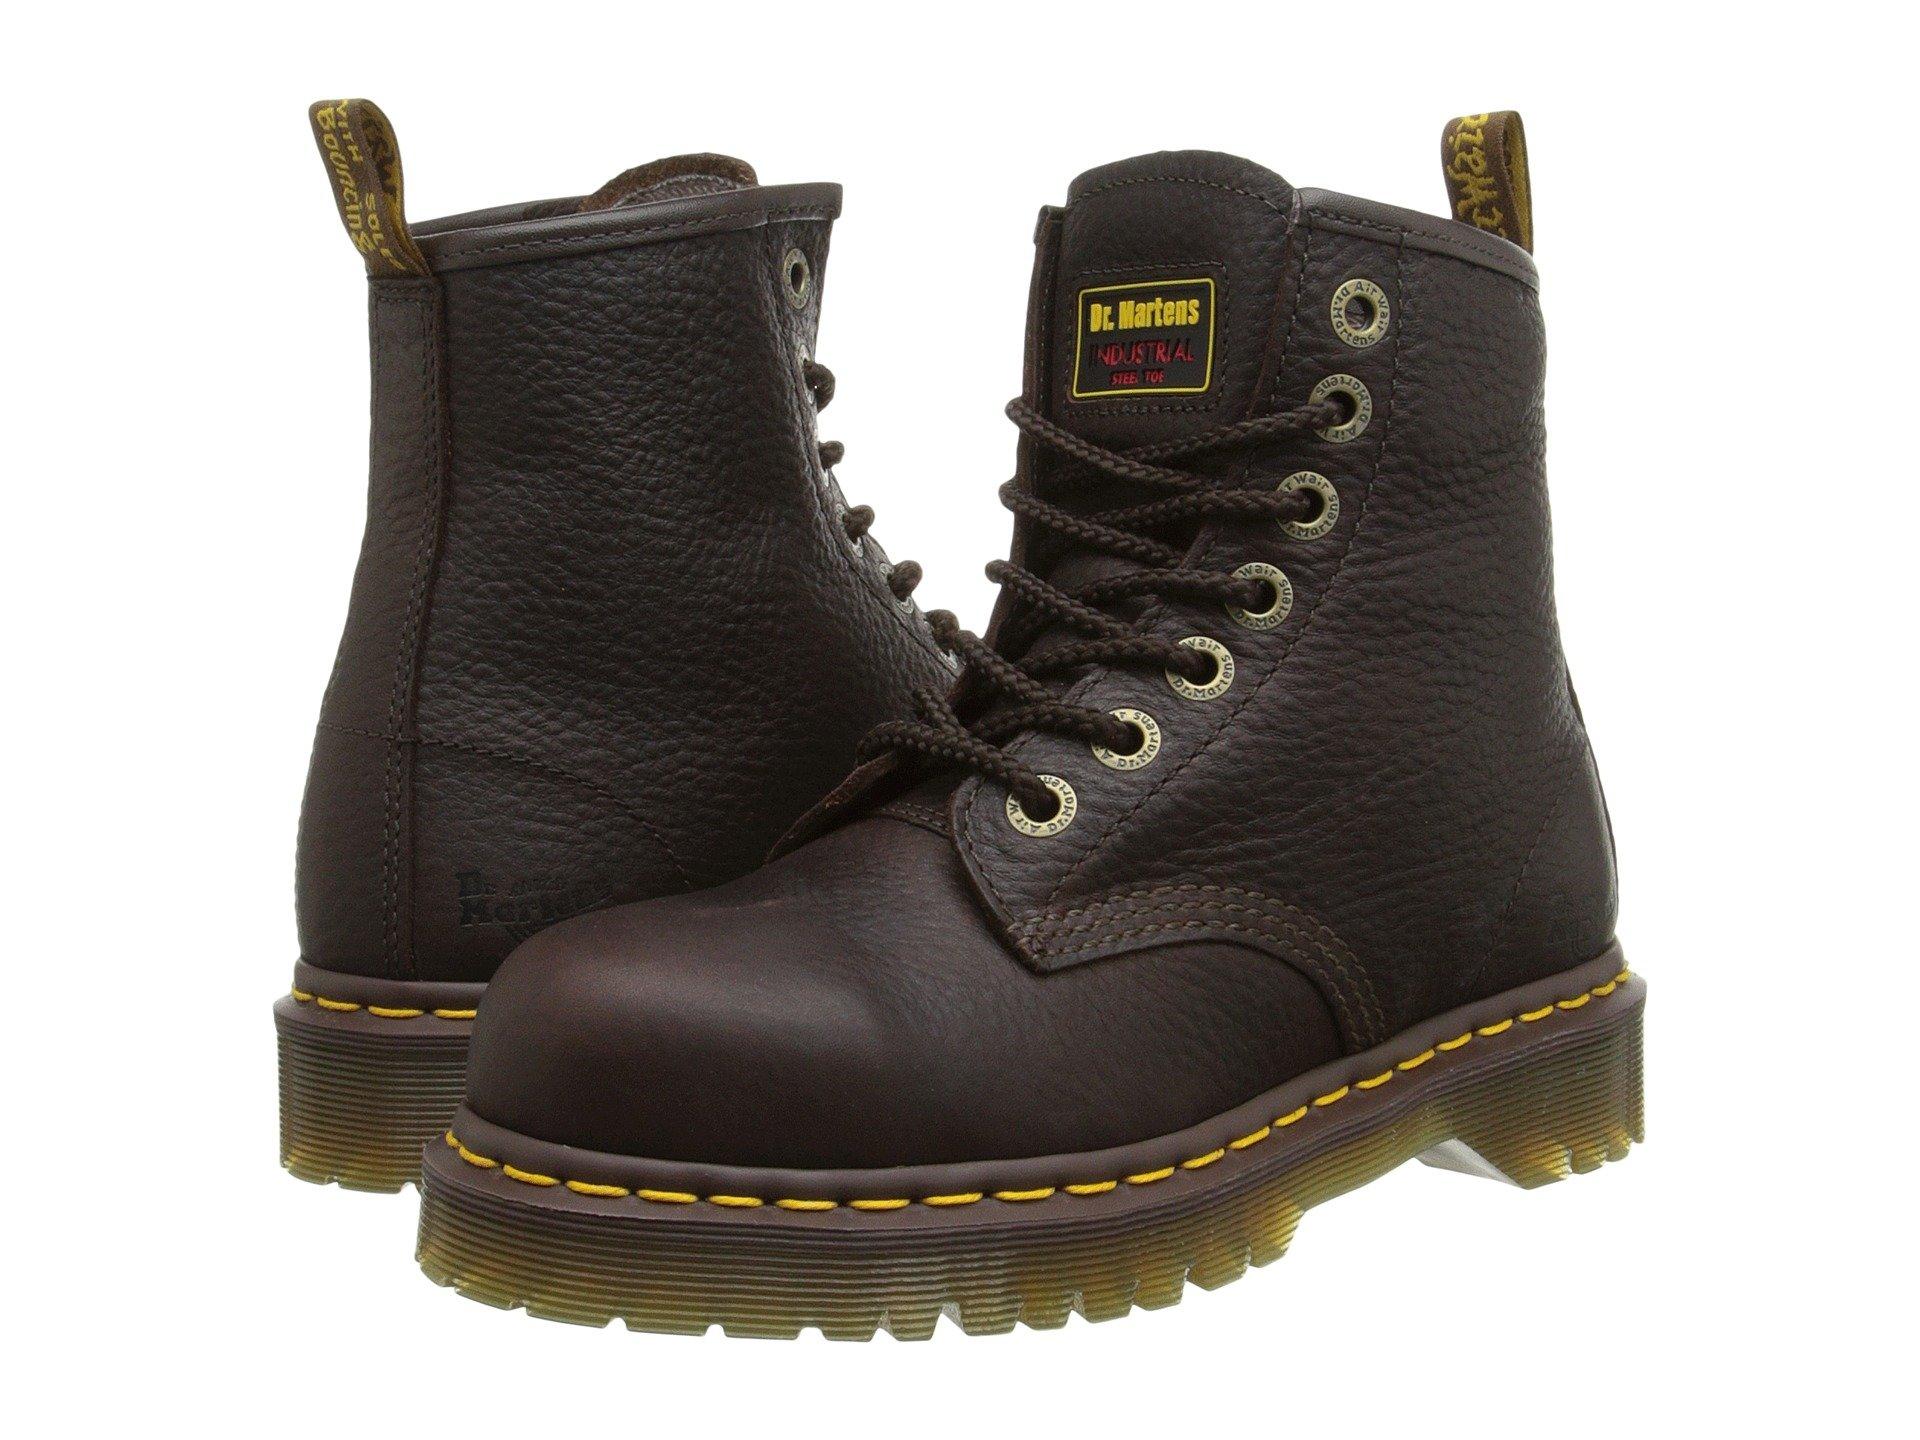 d7e1fb5e6a2c79 Women s Dr. Martens Work Boots + FREE SHIPPING